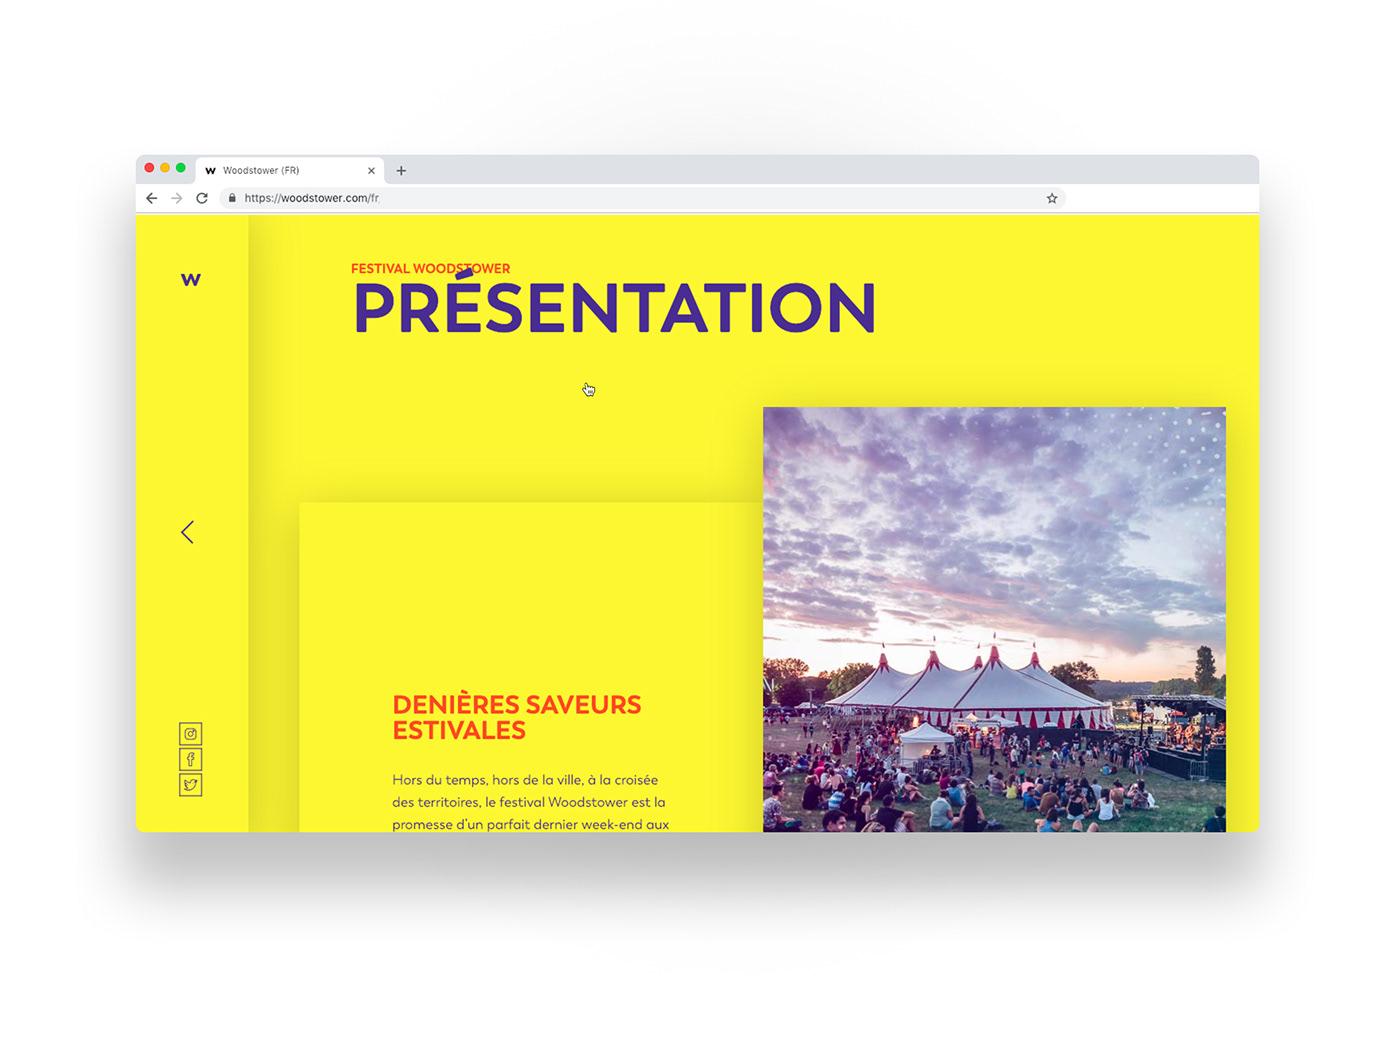 Webdesign design UX deign UI HTML jquery wordpress interactions